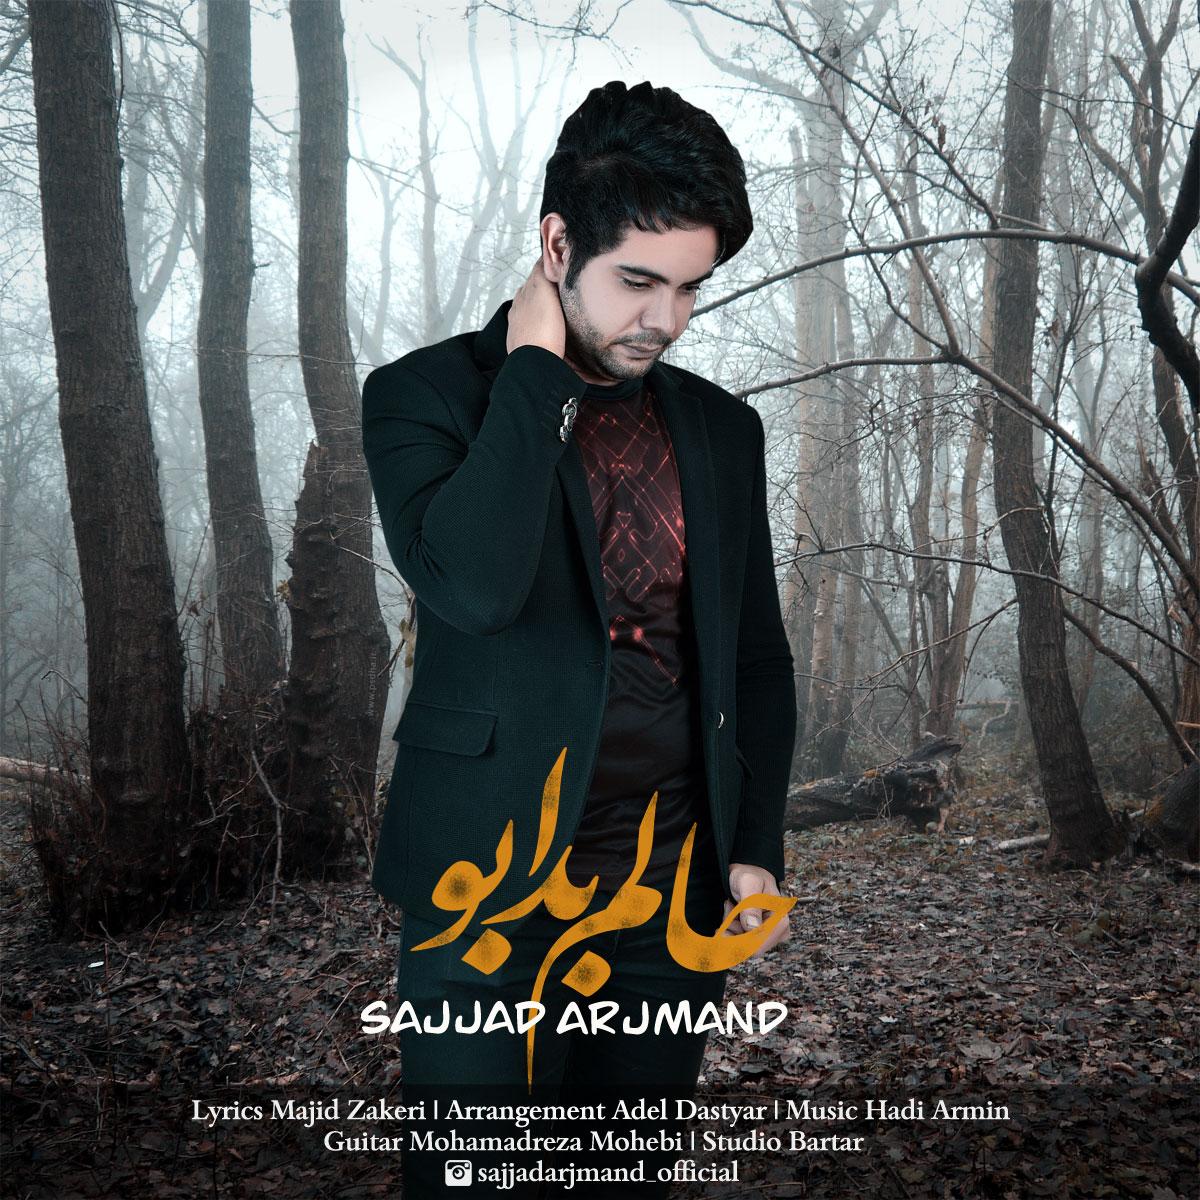 Sajjad Arjmand – Halom Bad Abo